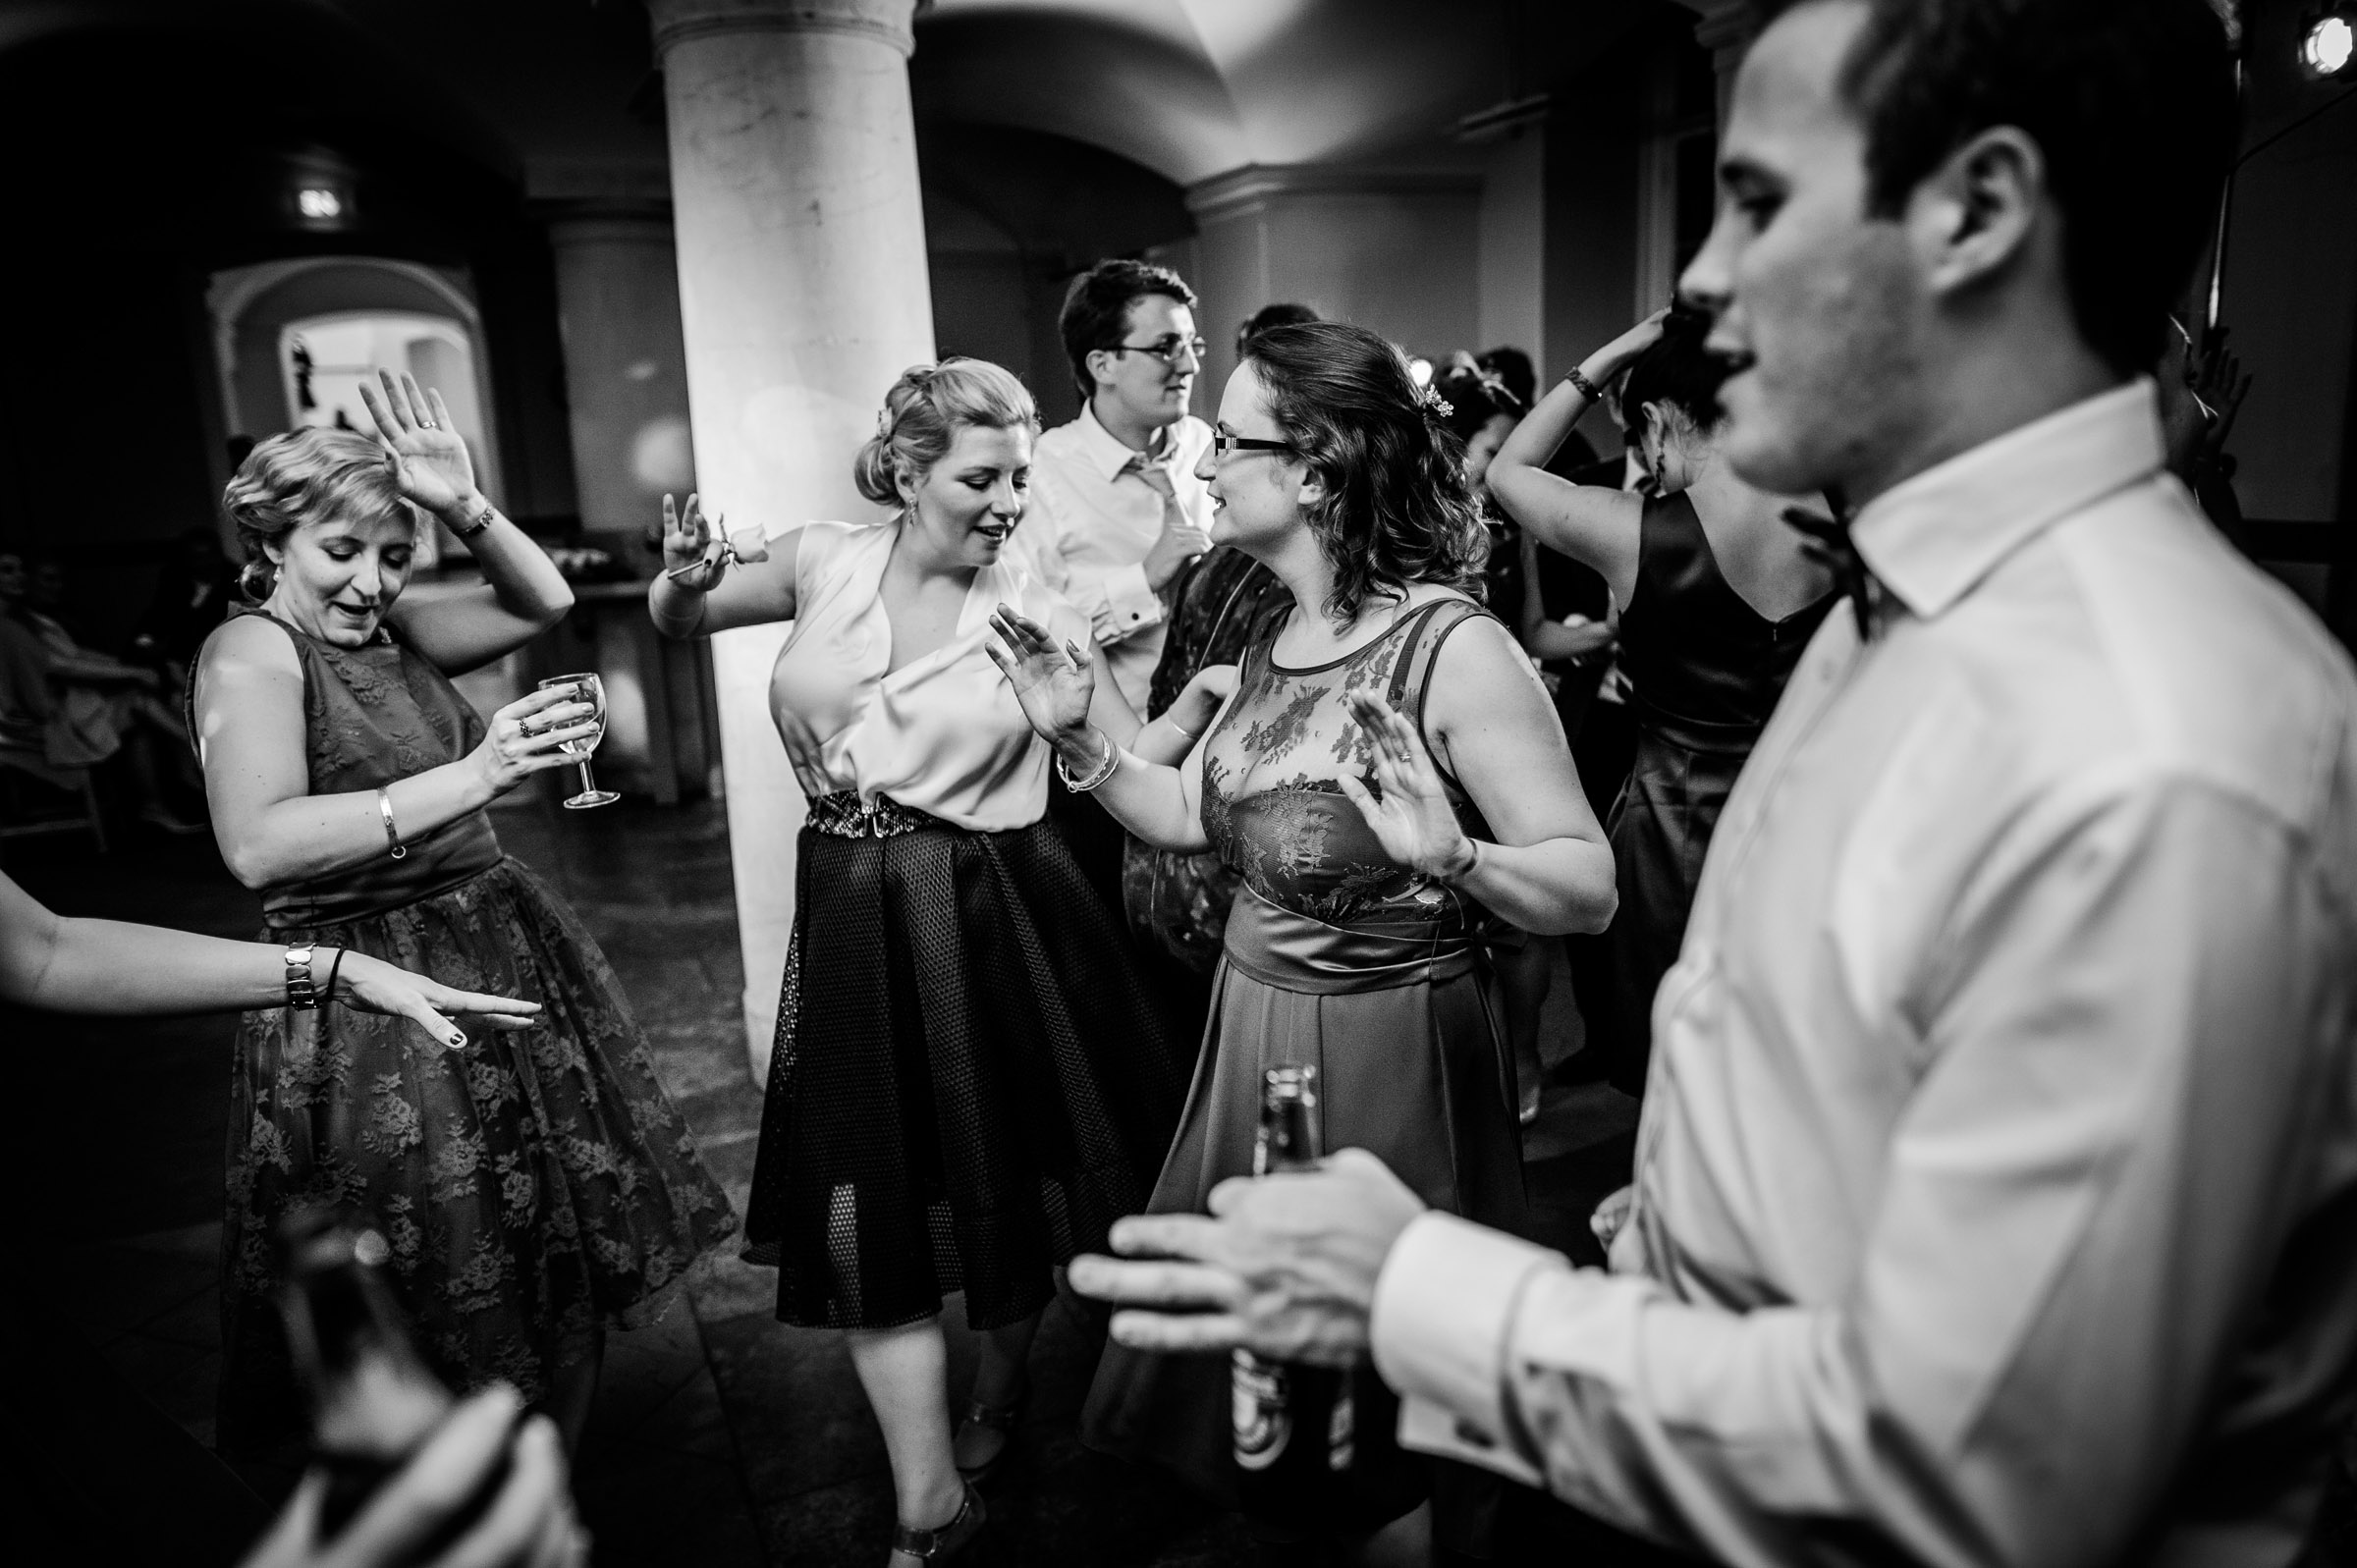 Ashmolean-Museum-Wedding-Pictures-0079.jpg